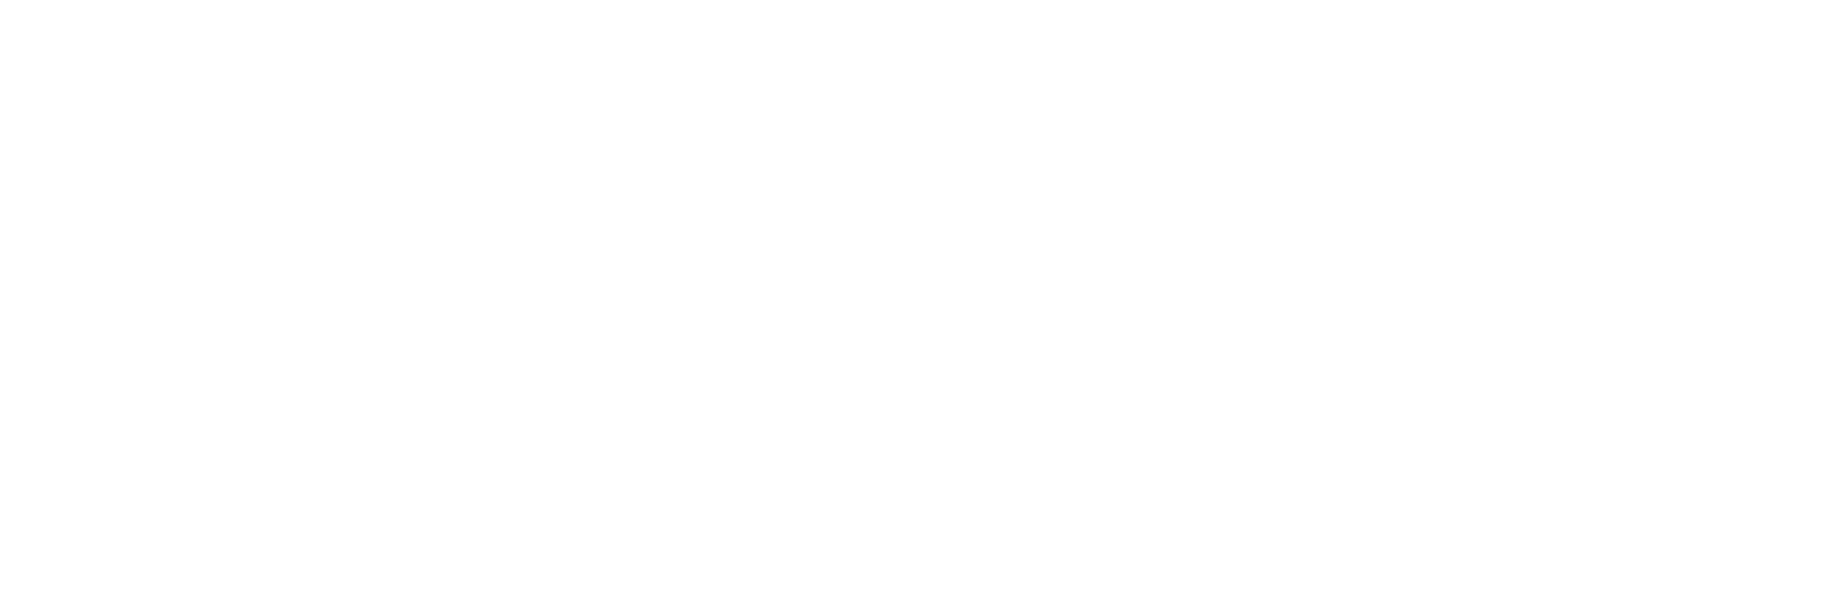 drag-drop-title.png